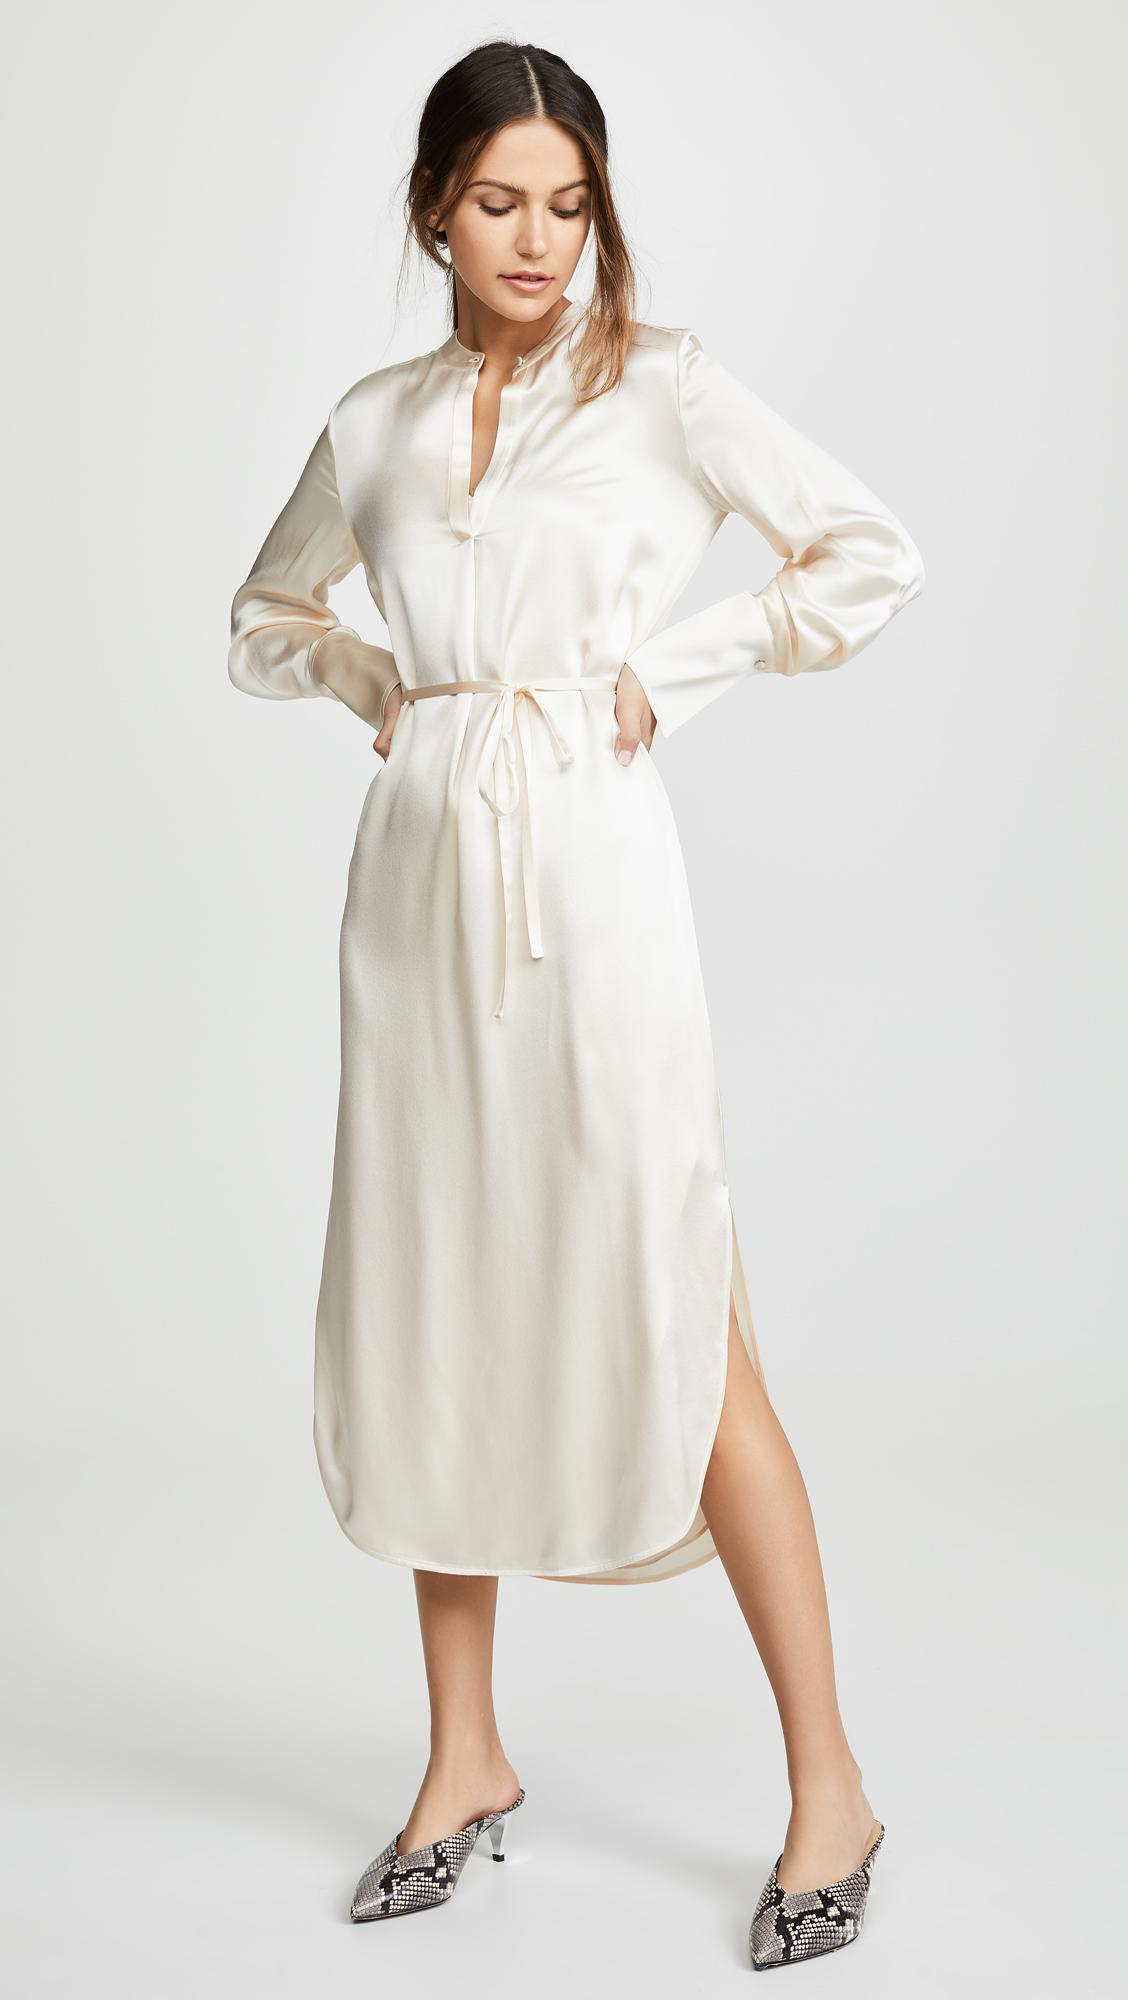 f604bacfe8ba5a Lyst - Vince Band Collar Shirtdress in White